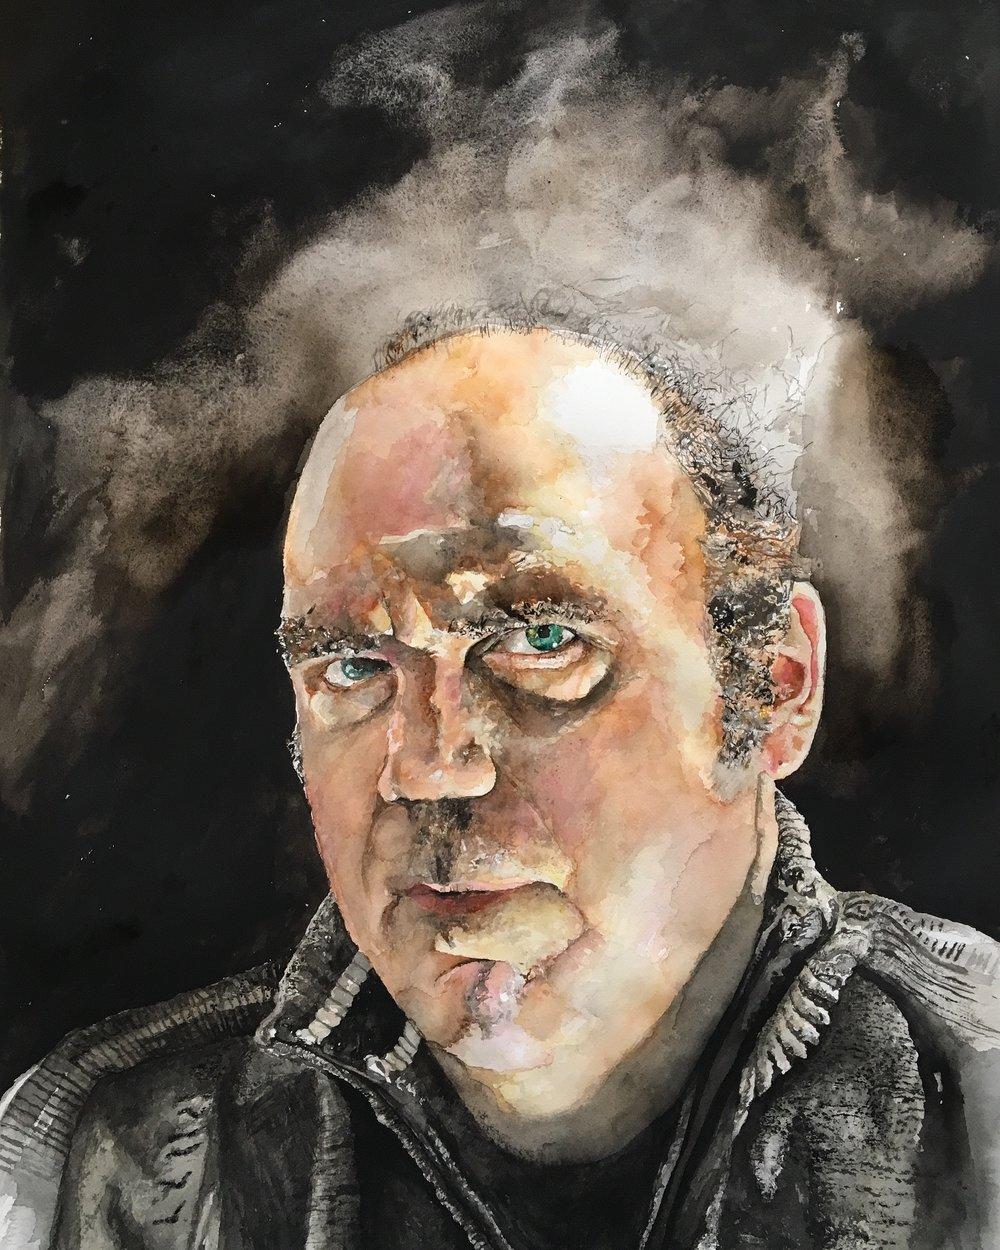 Frederick mit Smoke